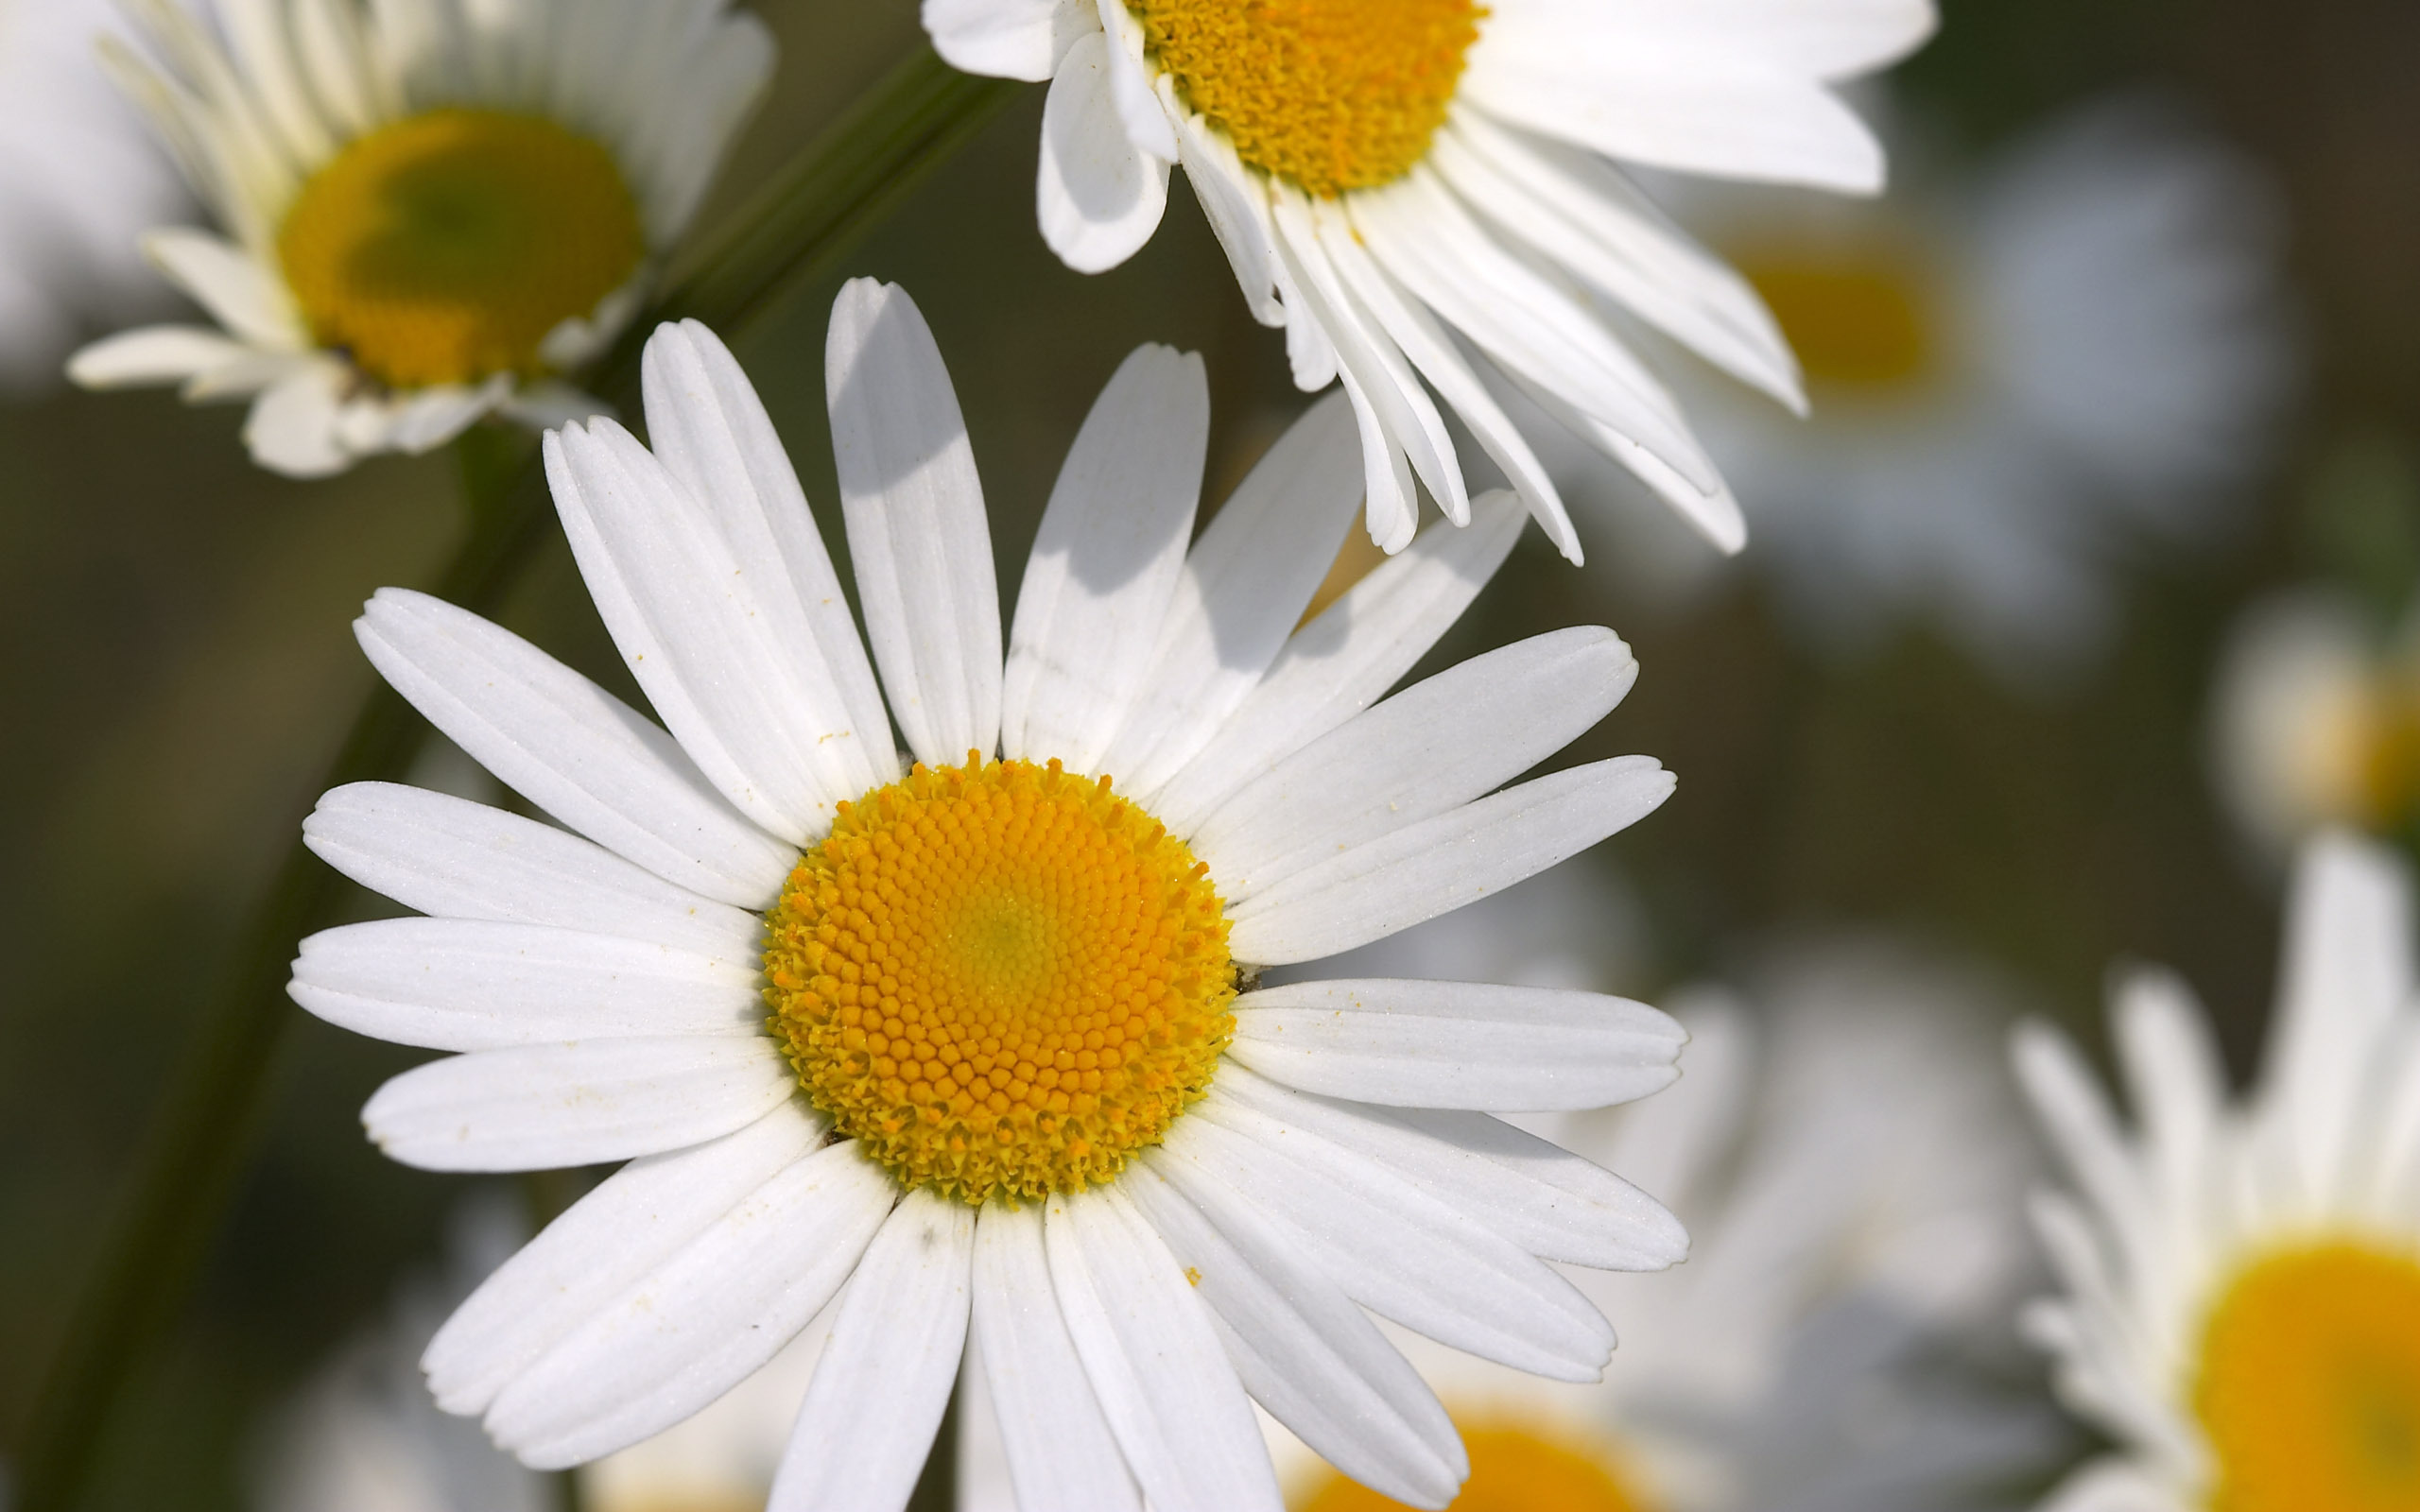 ромашка цветок улыбка бесплатно